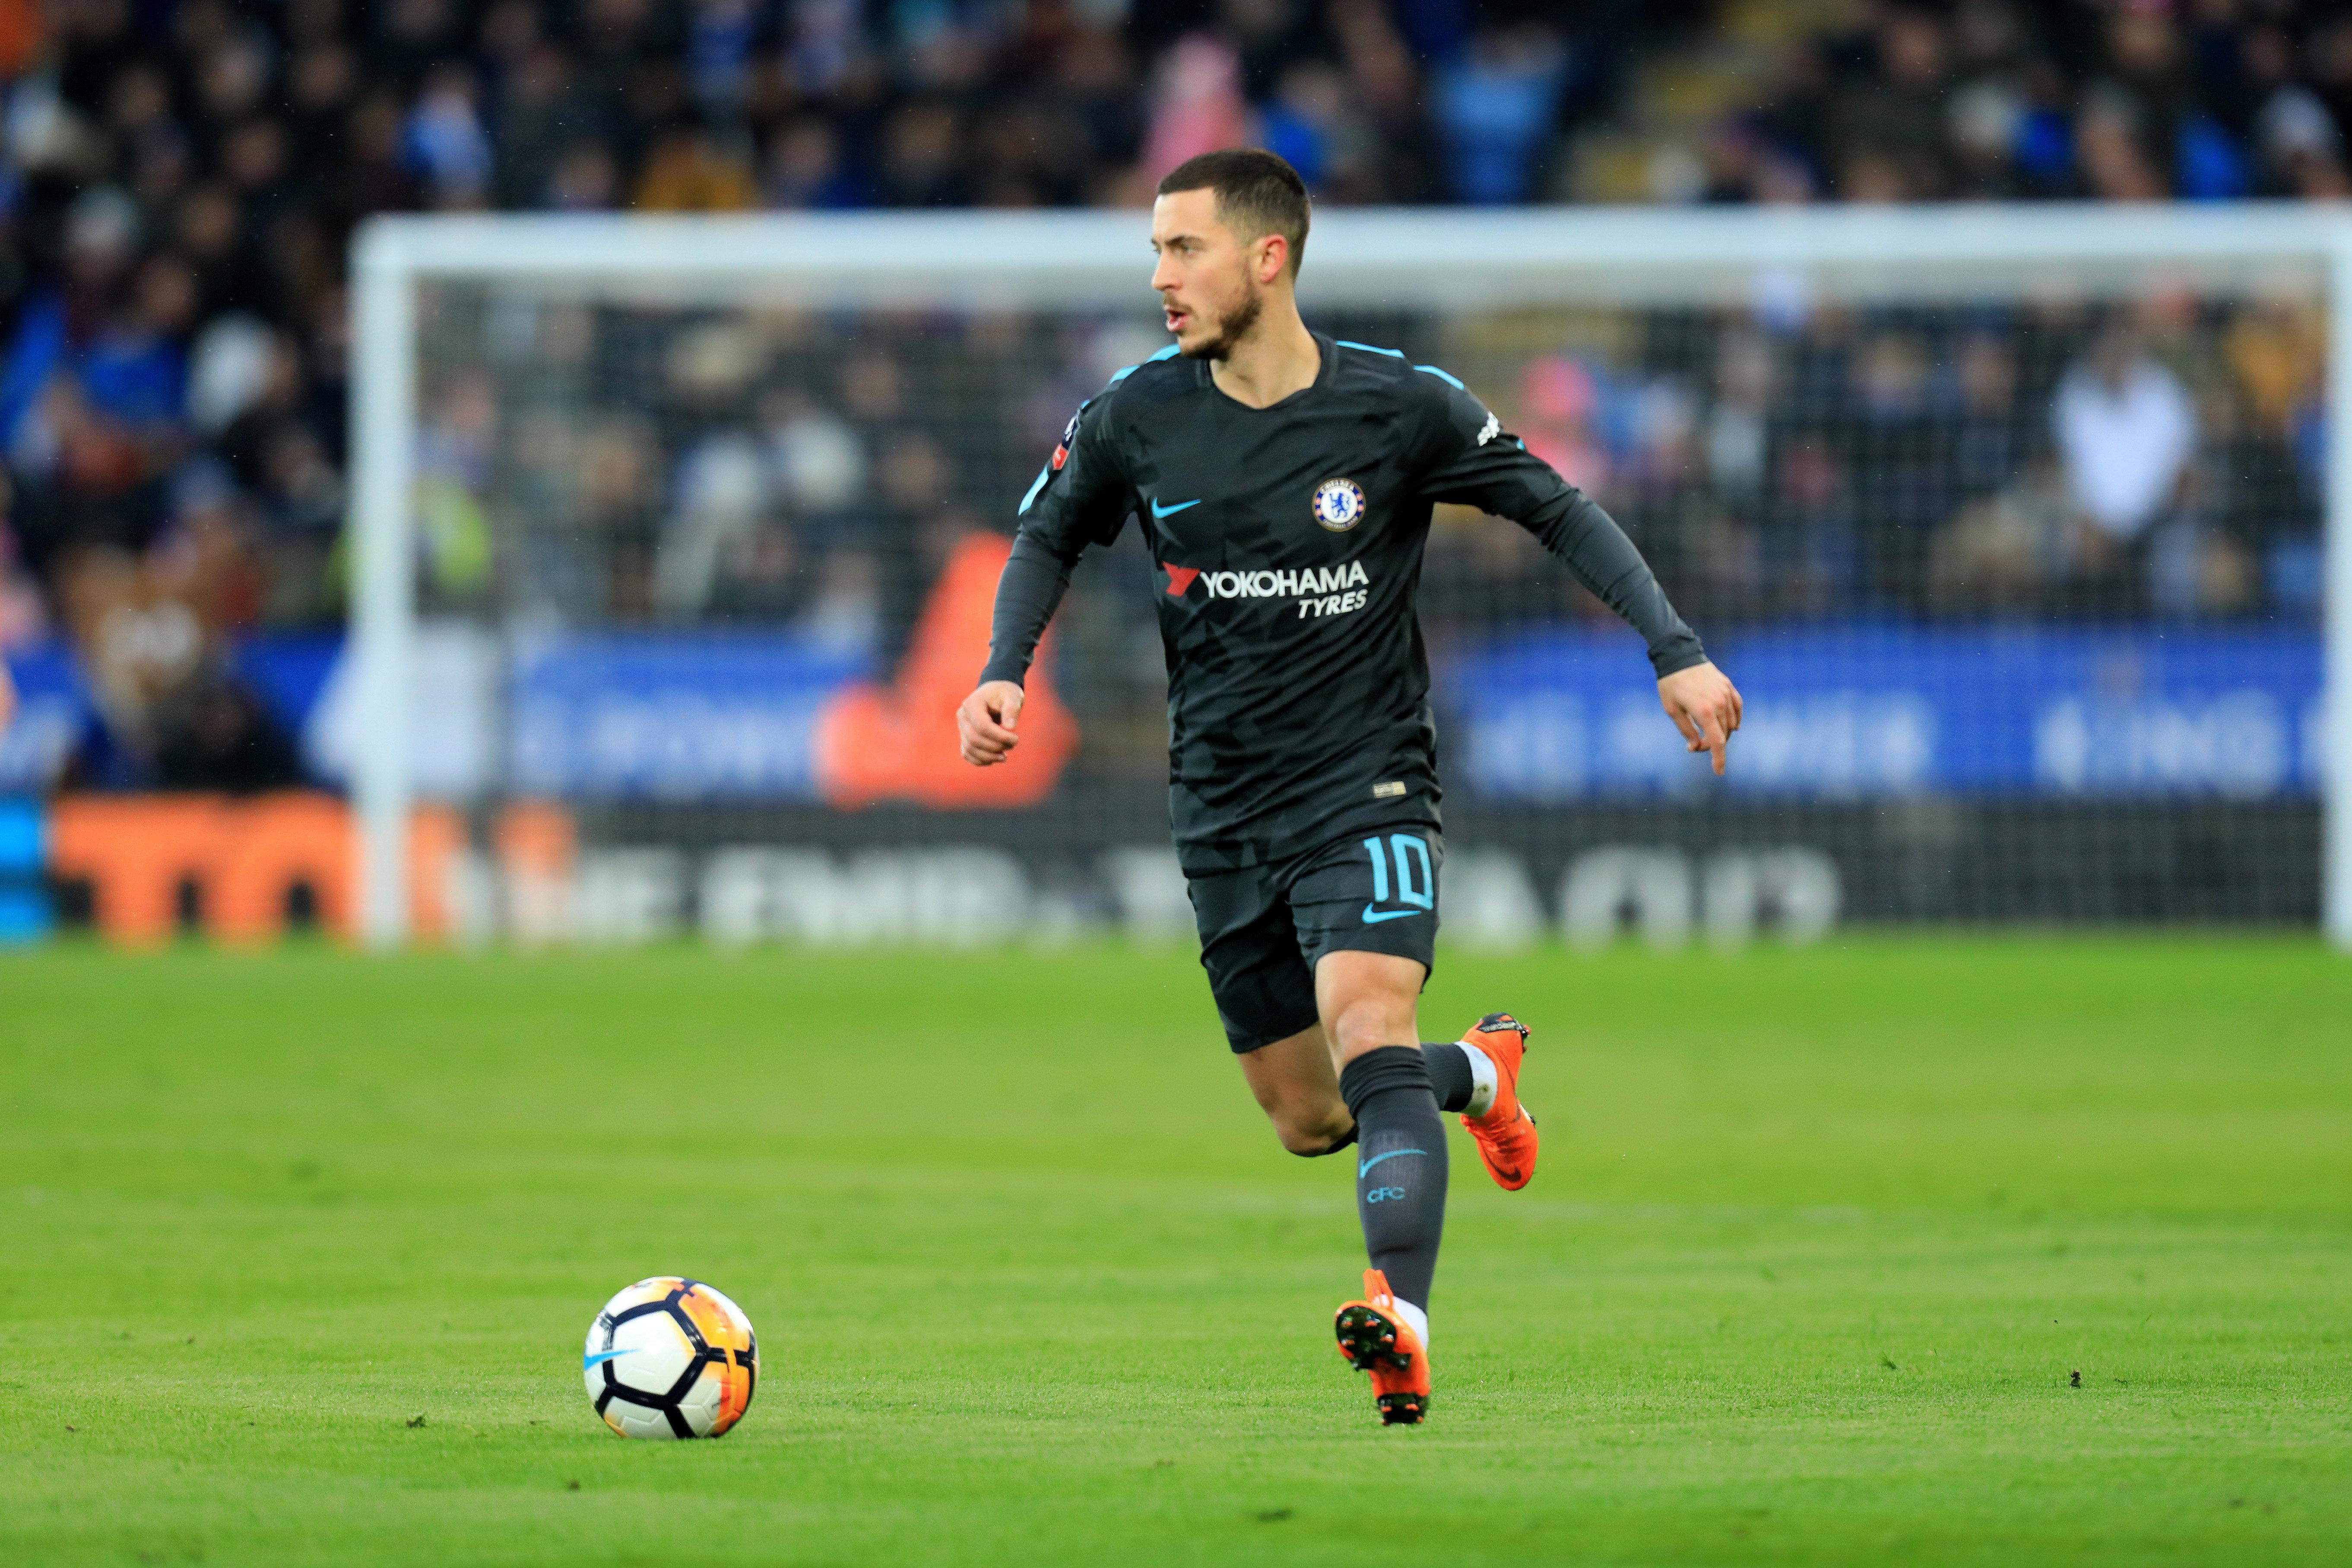 Football - Etranger - Premier League : Burnley-Chelsea en direct